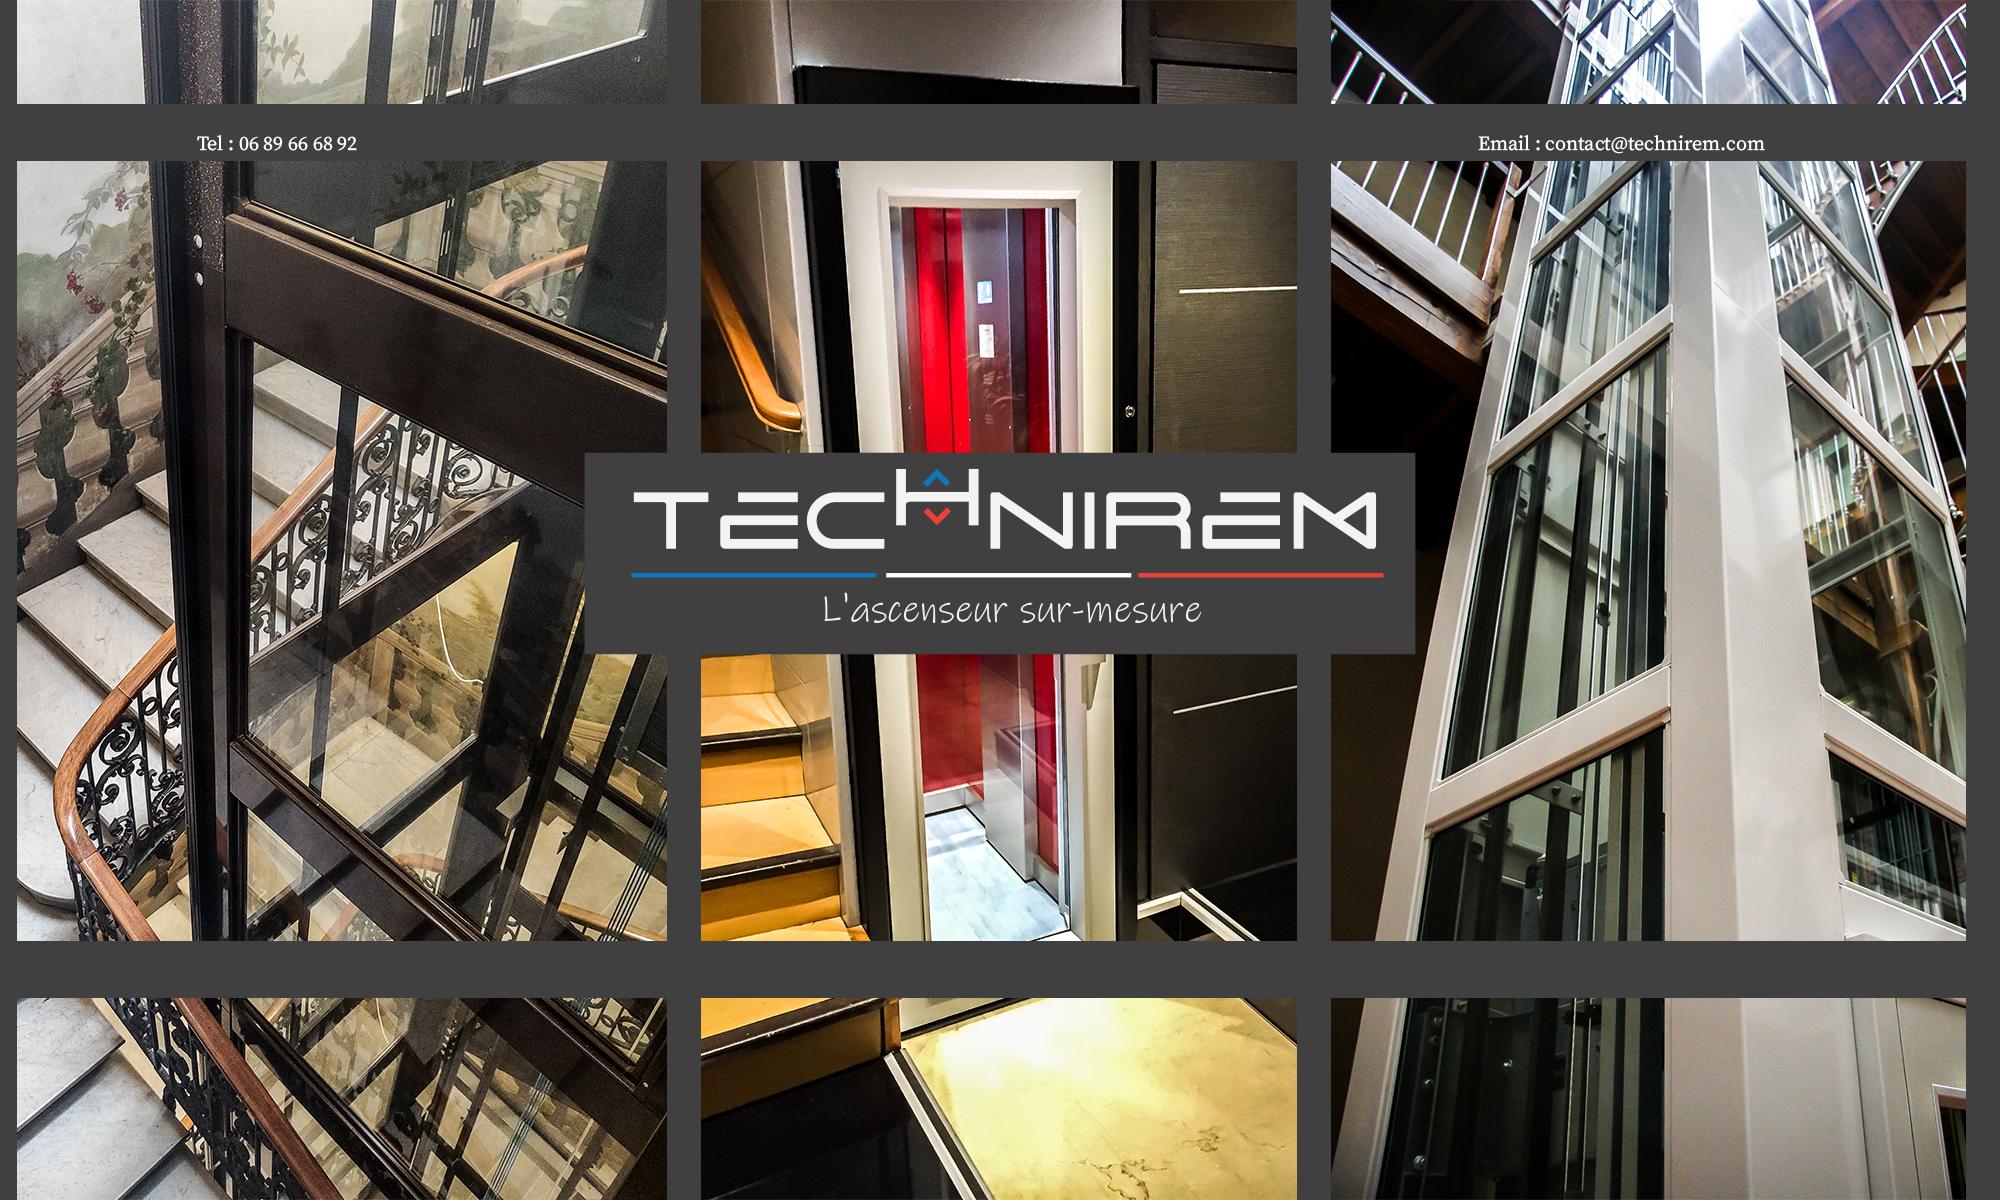 Technirem